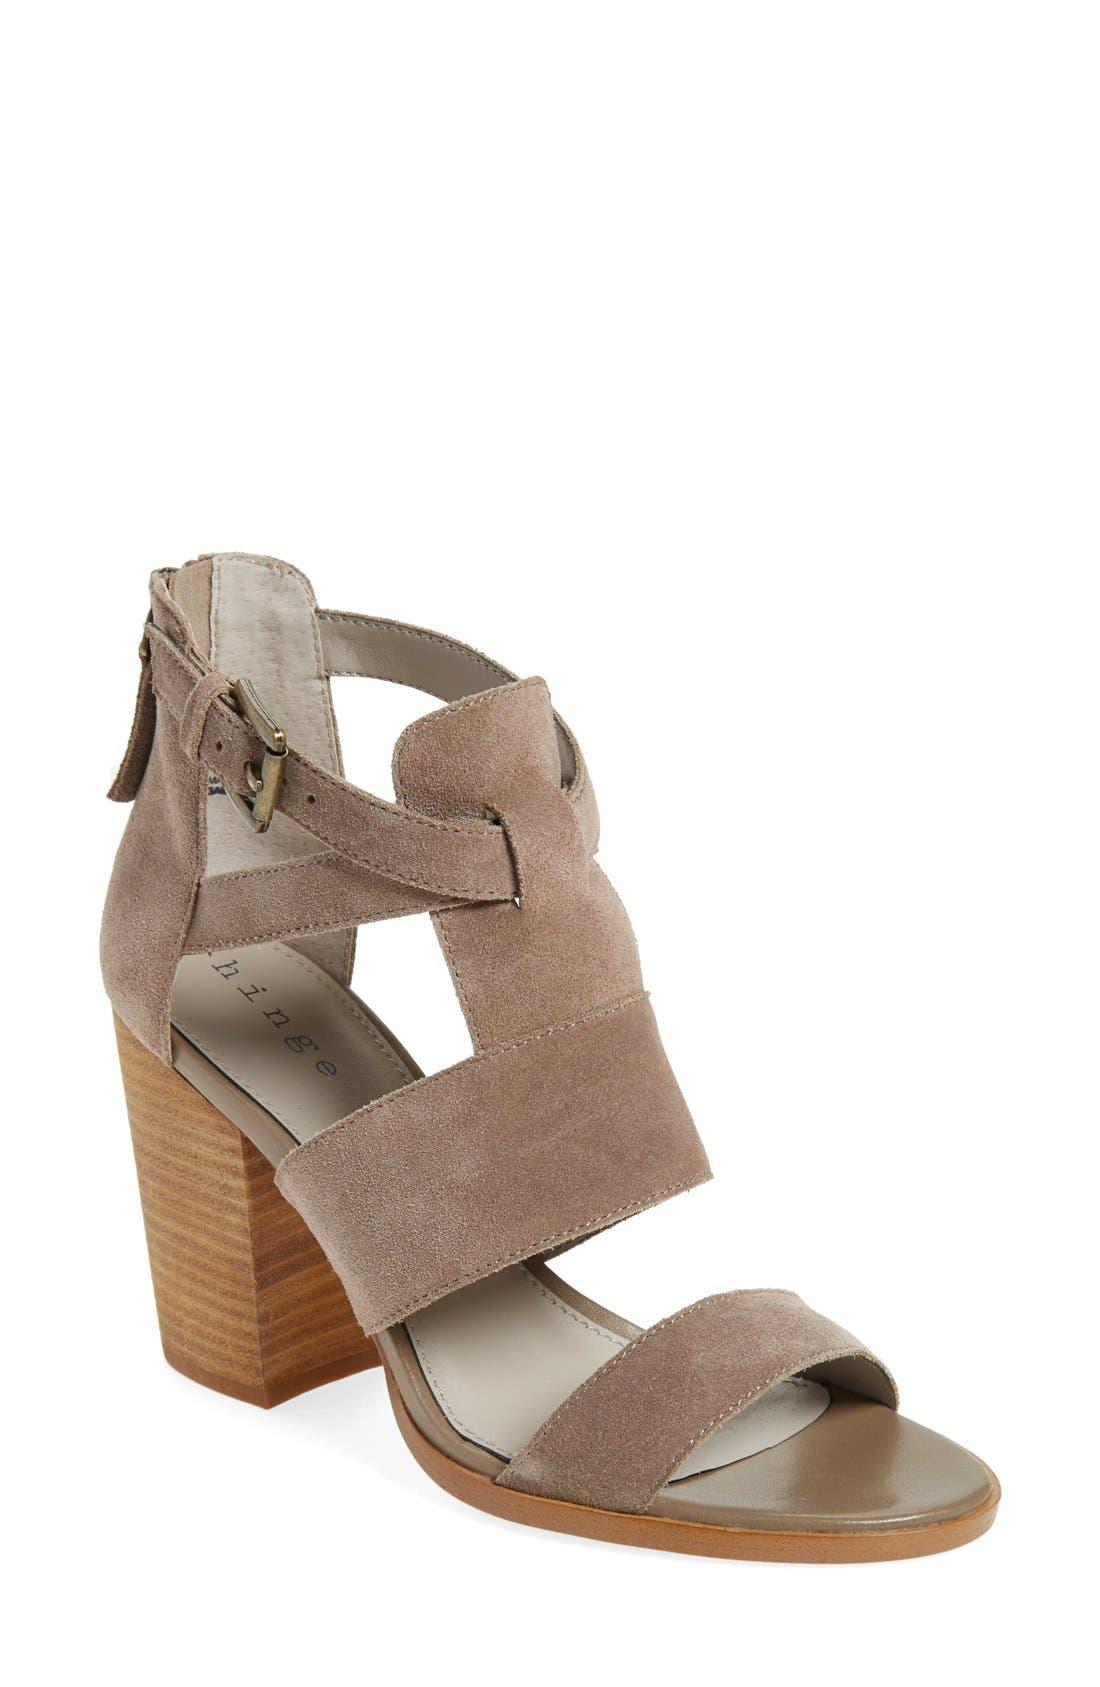 Main Image - Hinge 'Cora' Block Heel Sandal (Women)